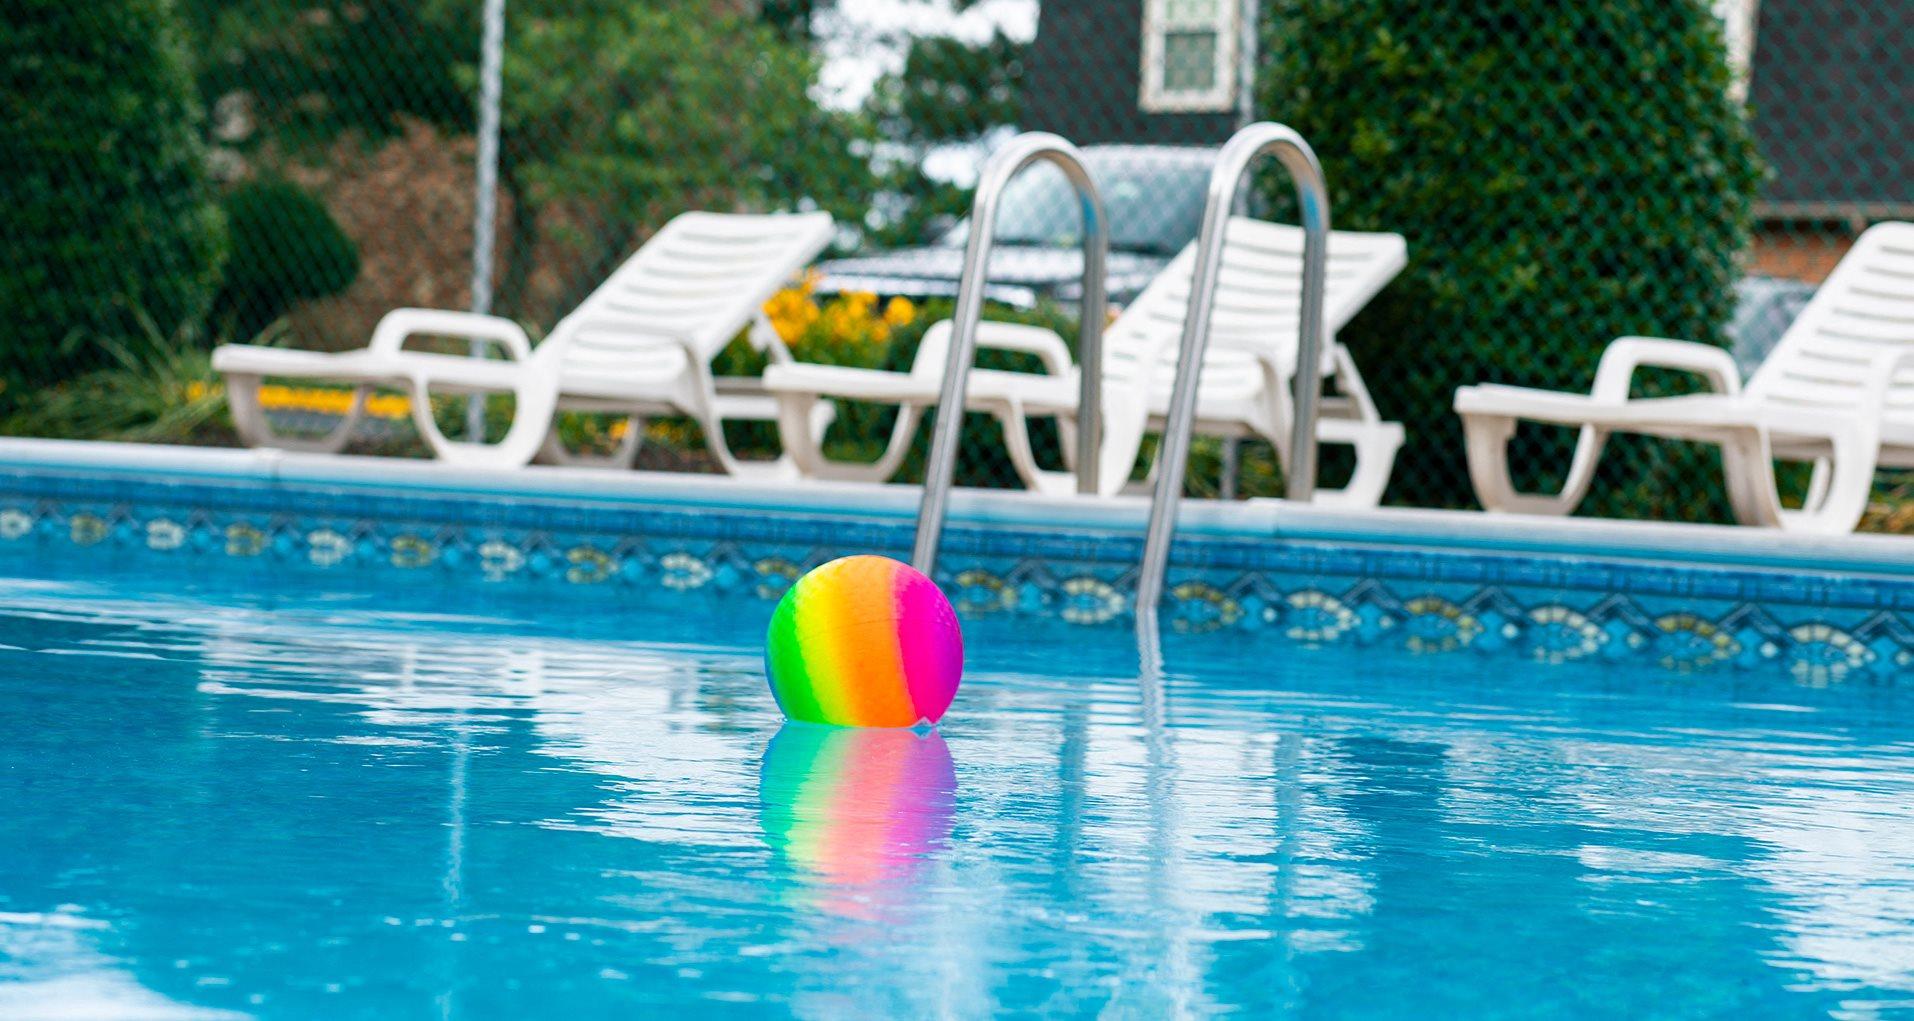 Pool 3 at Saddlewood Apartments